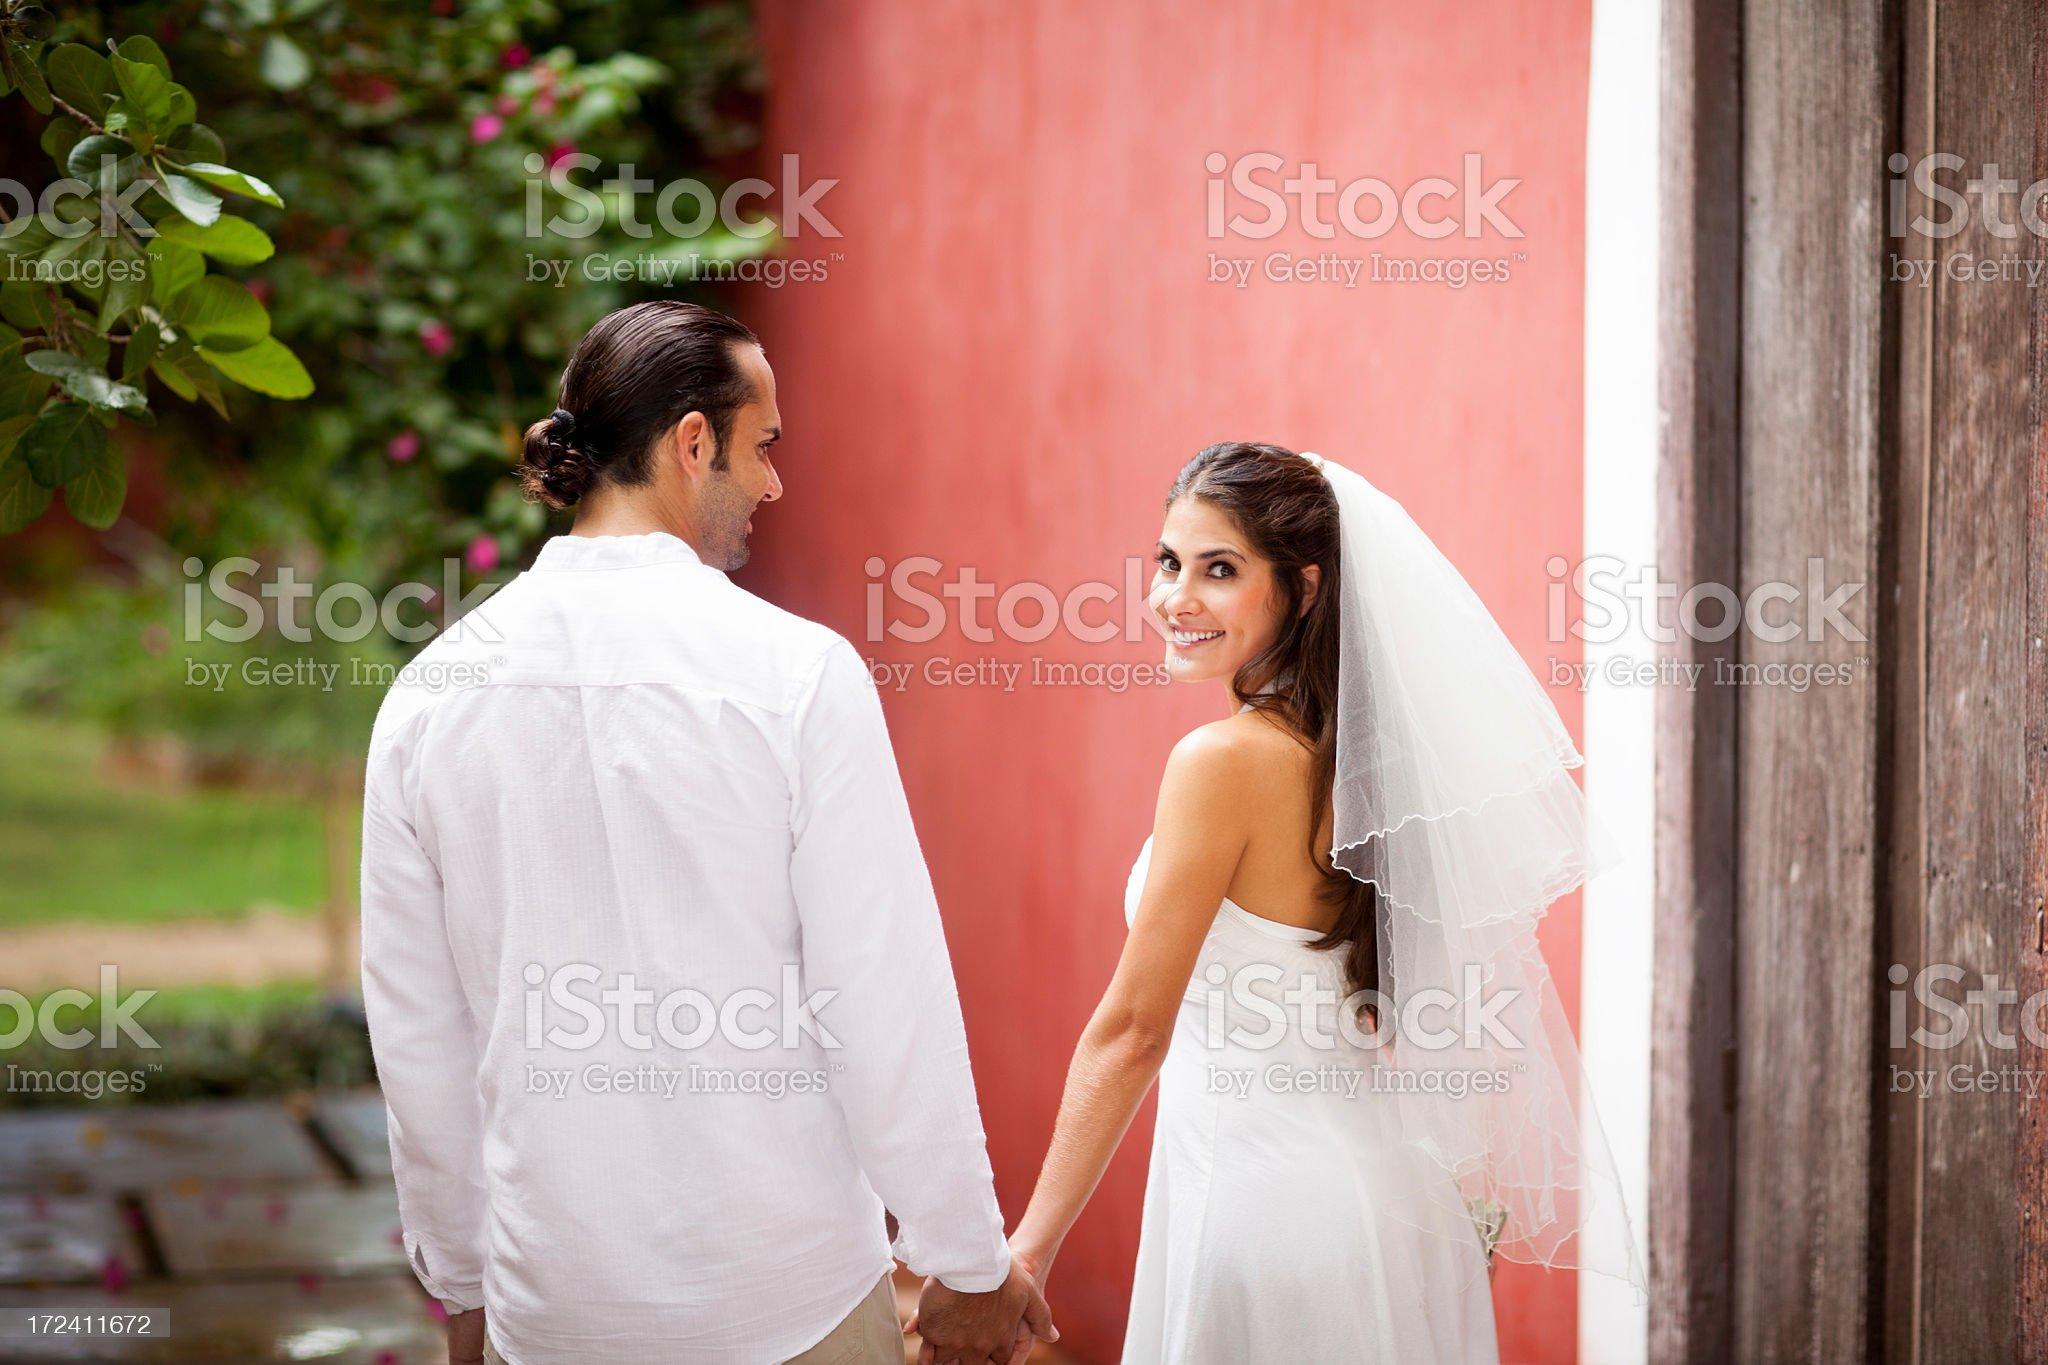 Adorable wedding couple walking royalty-free stock photo